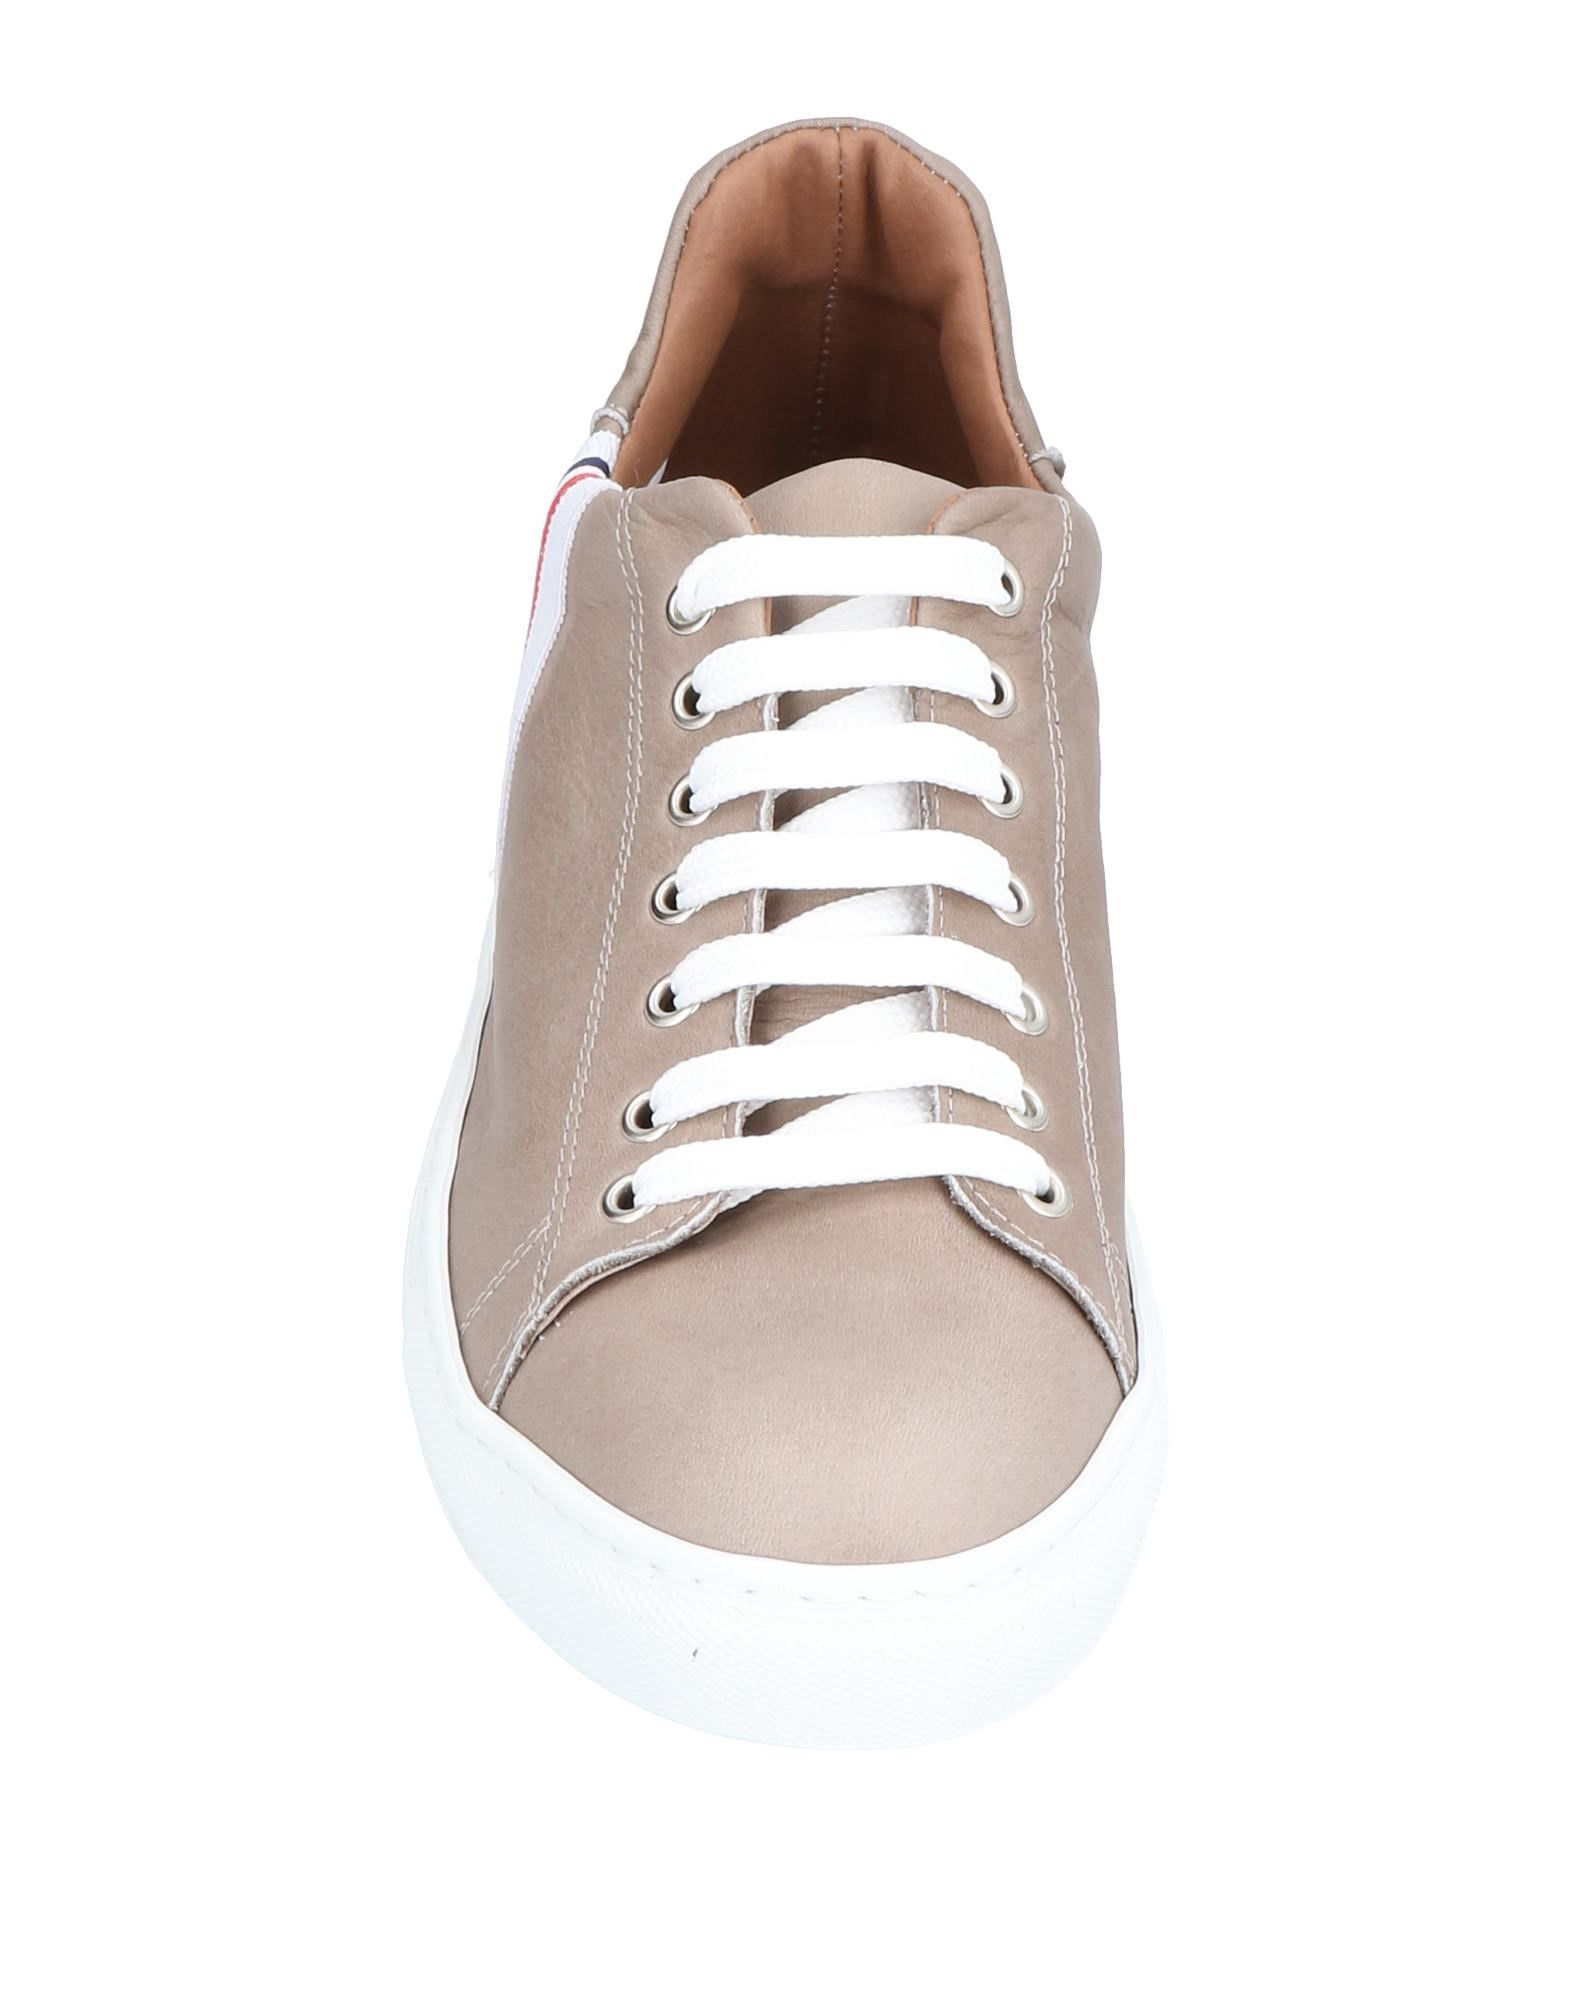 Rabatt echte  Schuhe Tsd12 Sneakers Herren  echte 11504265CV a71bec